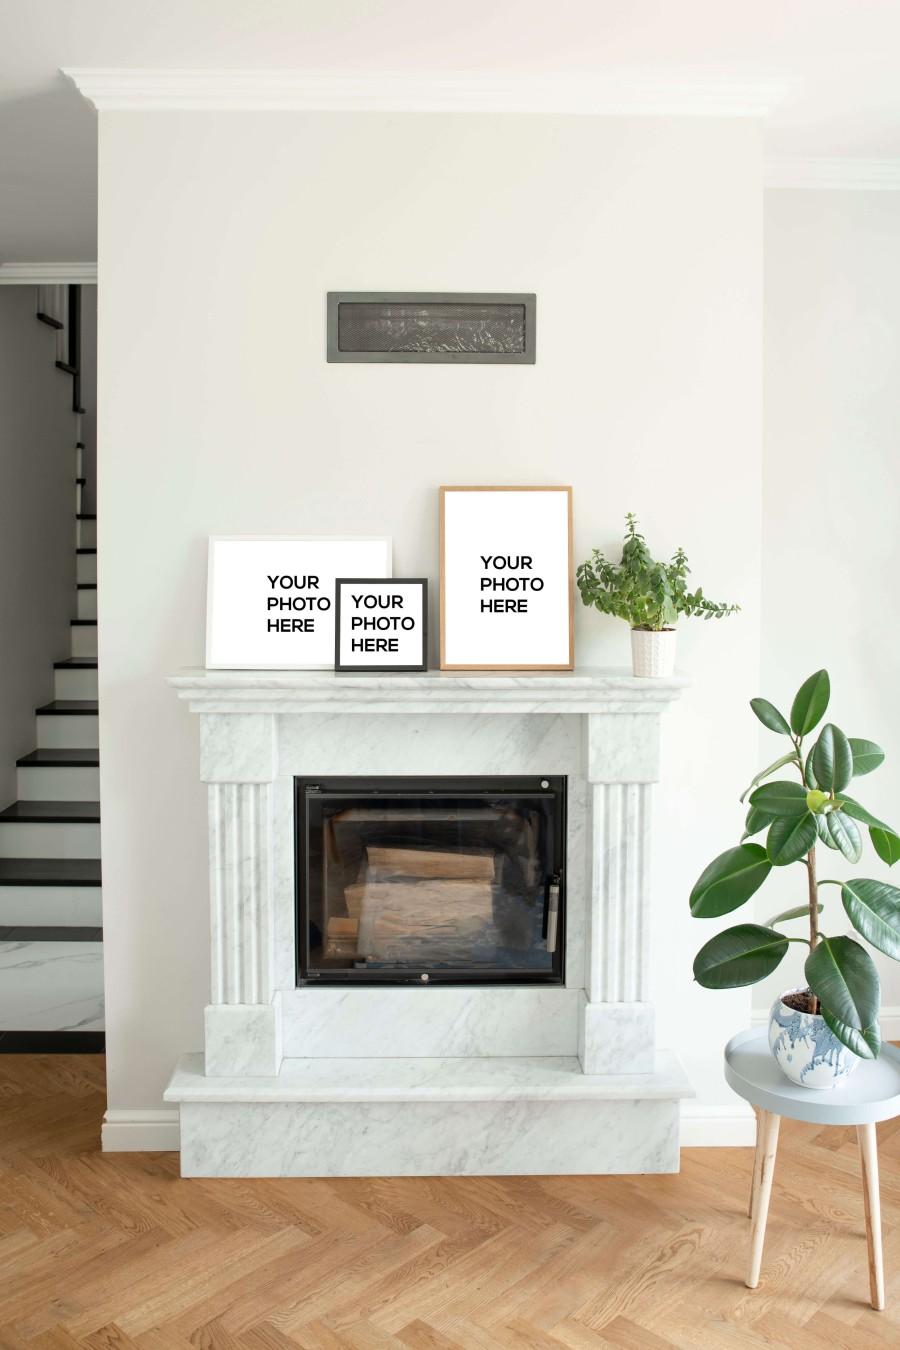 Wall Decor Mockups on Full Fireplace set